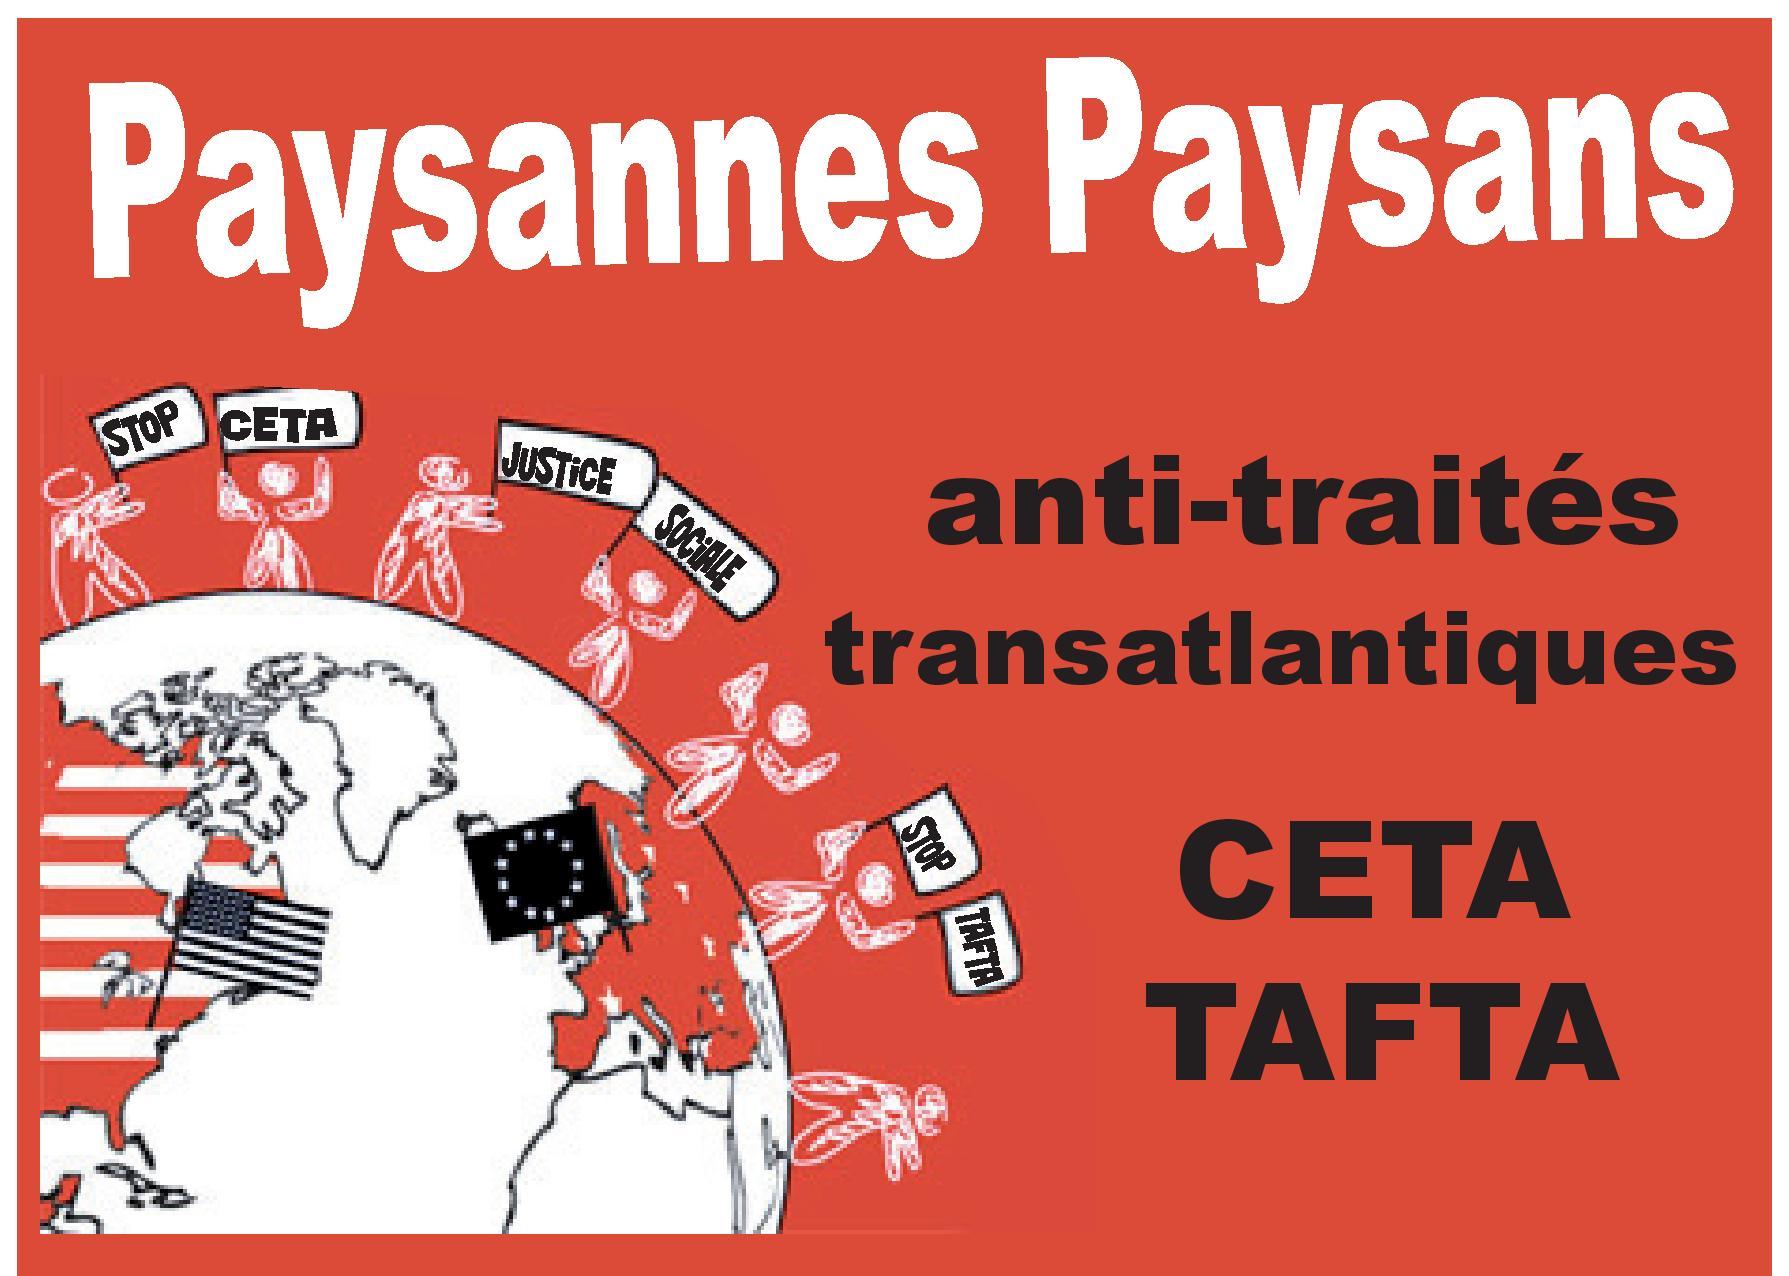 affiche paysan-nesHors TAFTA-page-001